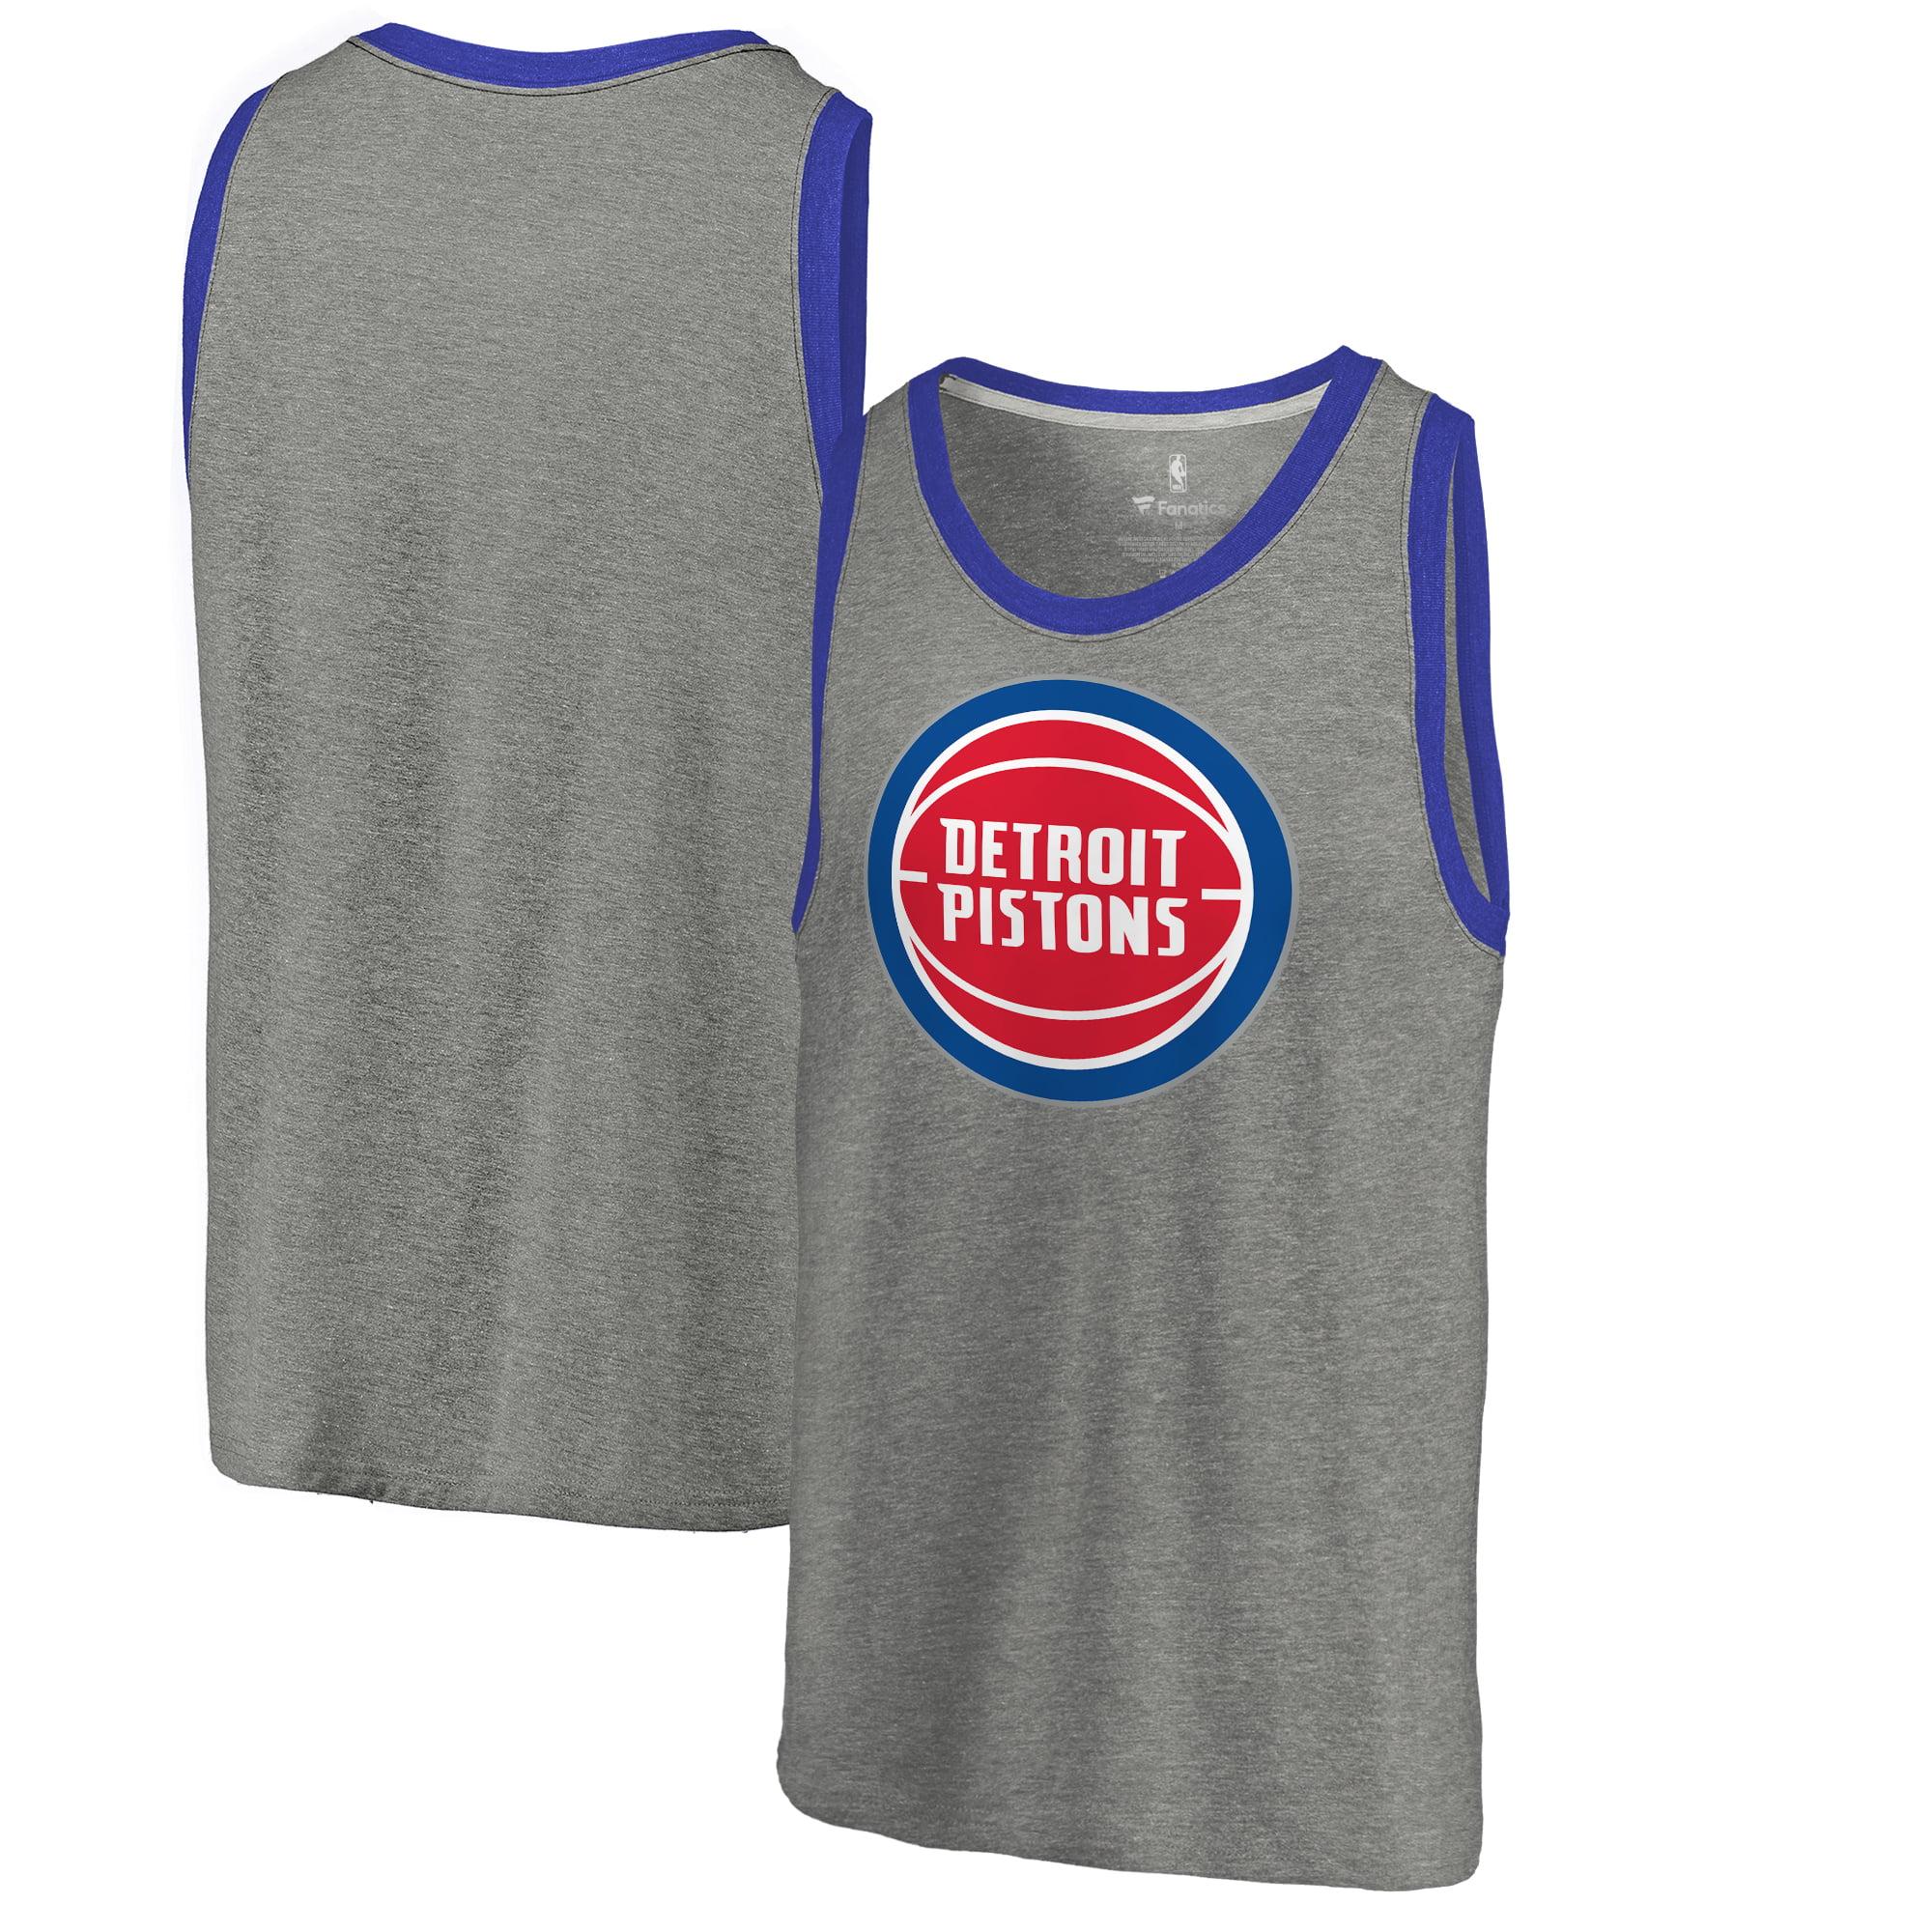 Detroit Pistons Team Essential Tank Top - Heather Gray